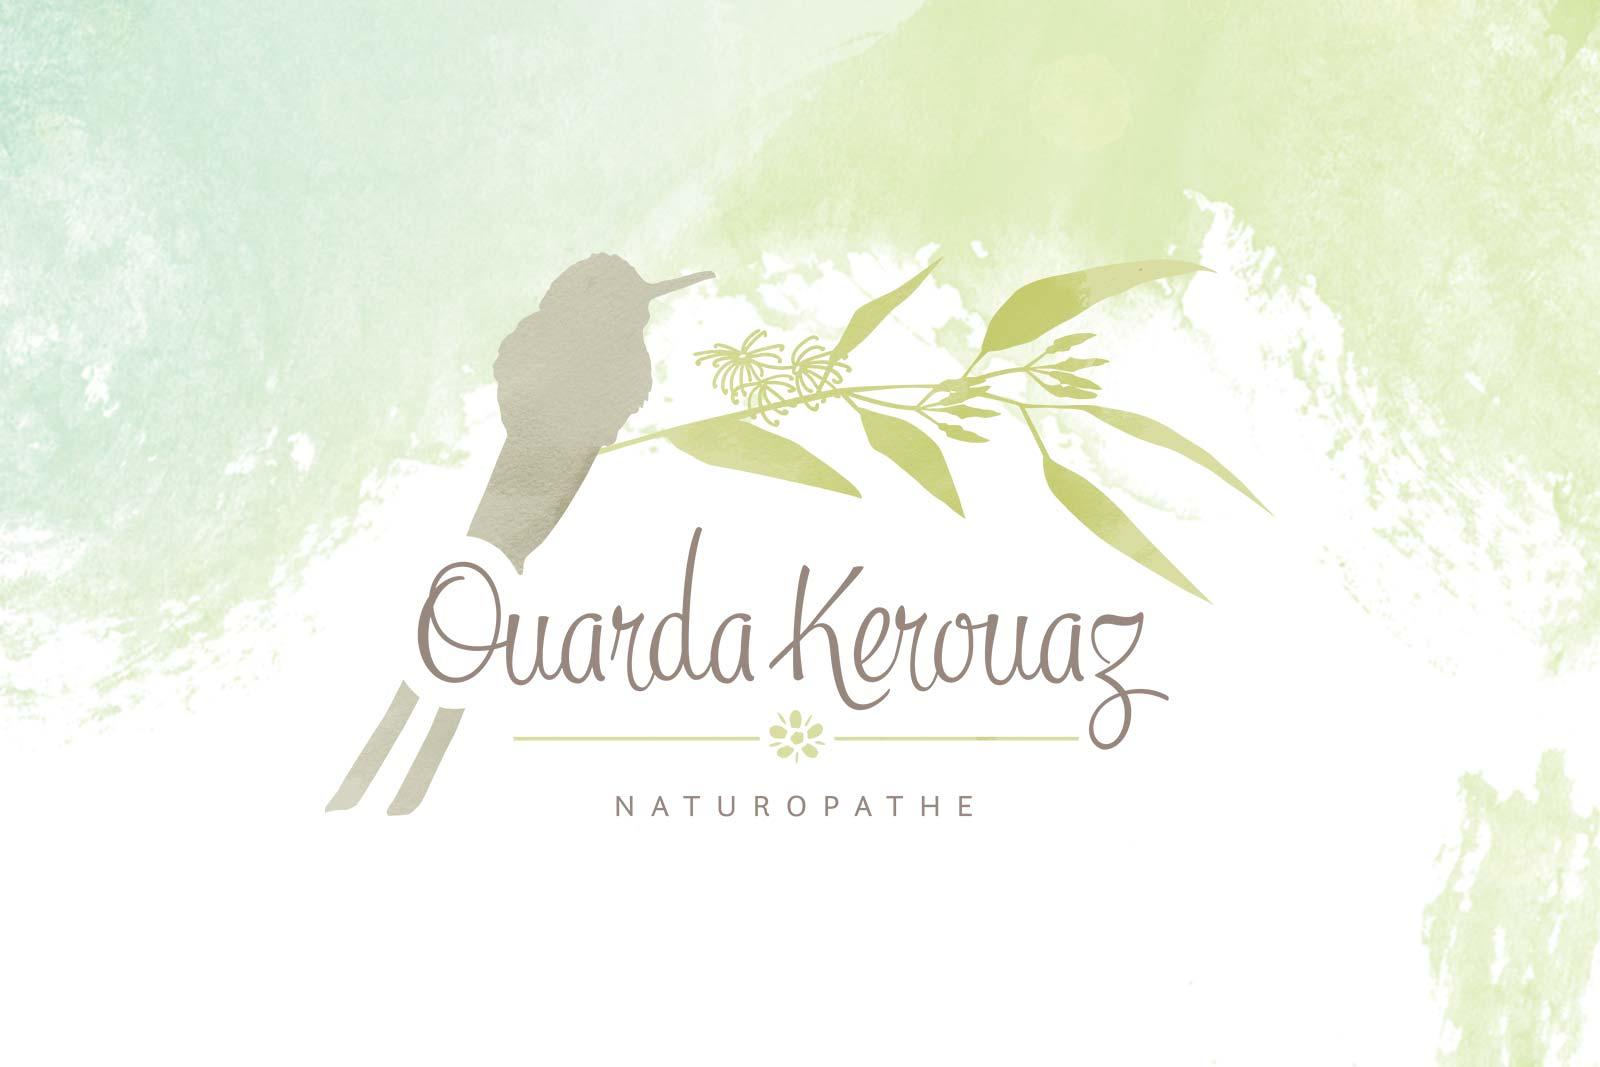 Ouarda Kerouaz - Naturopathe